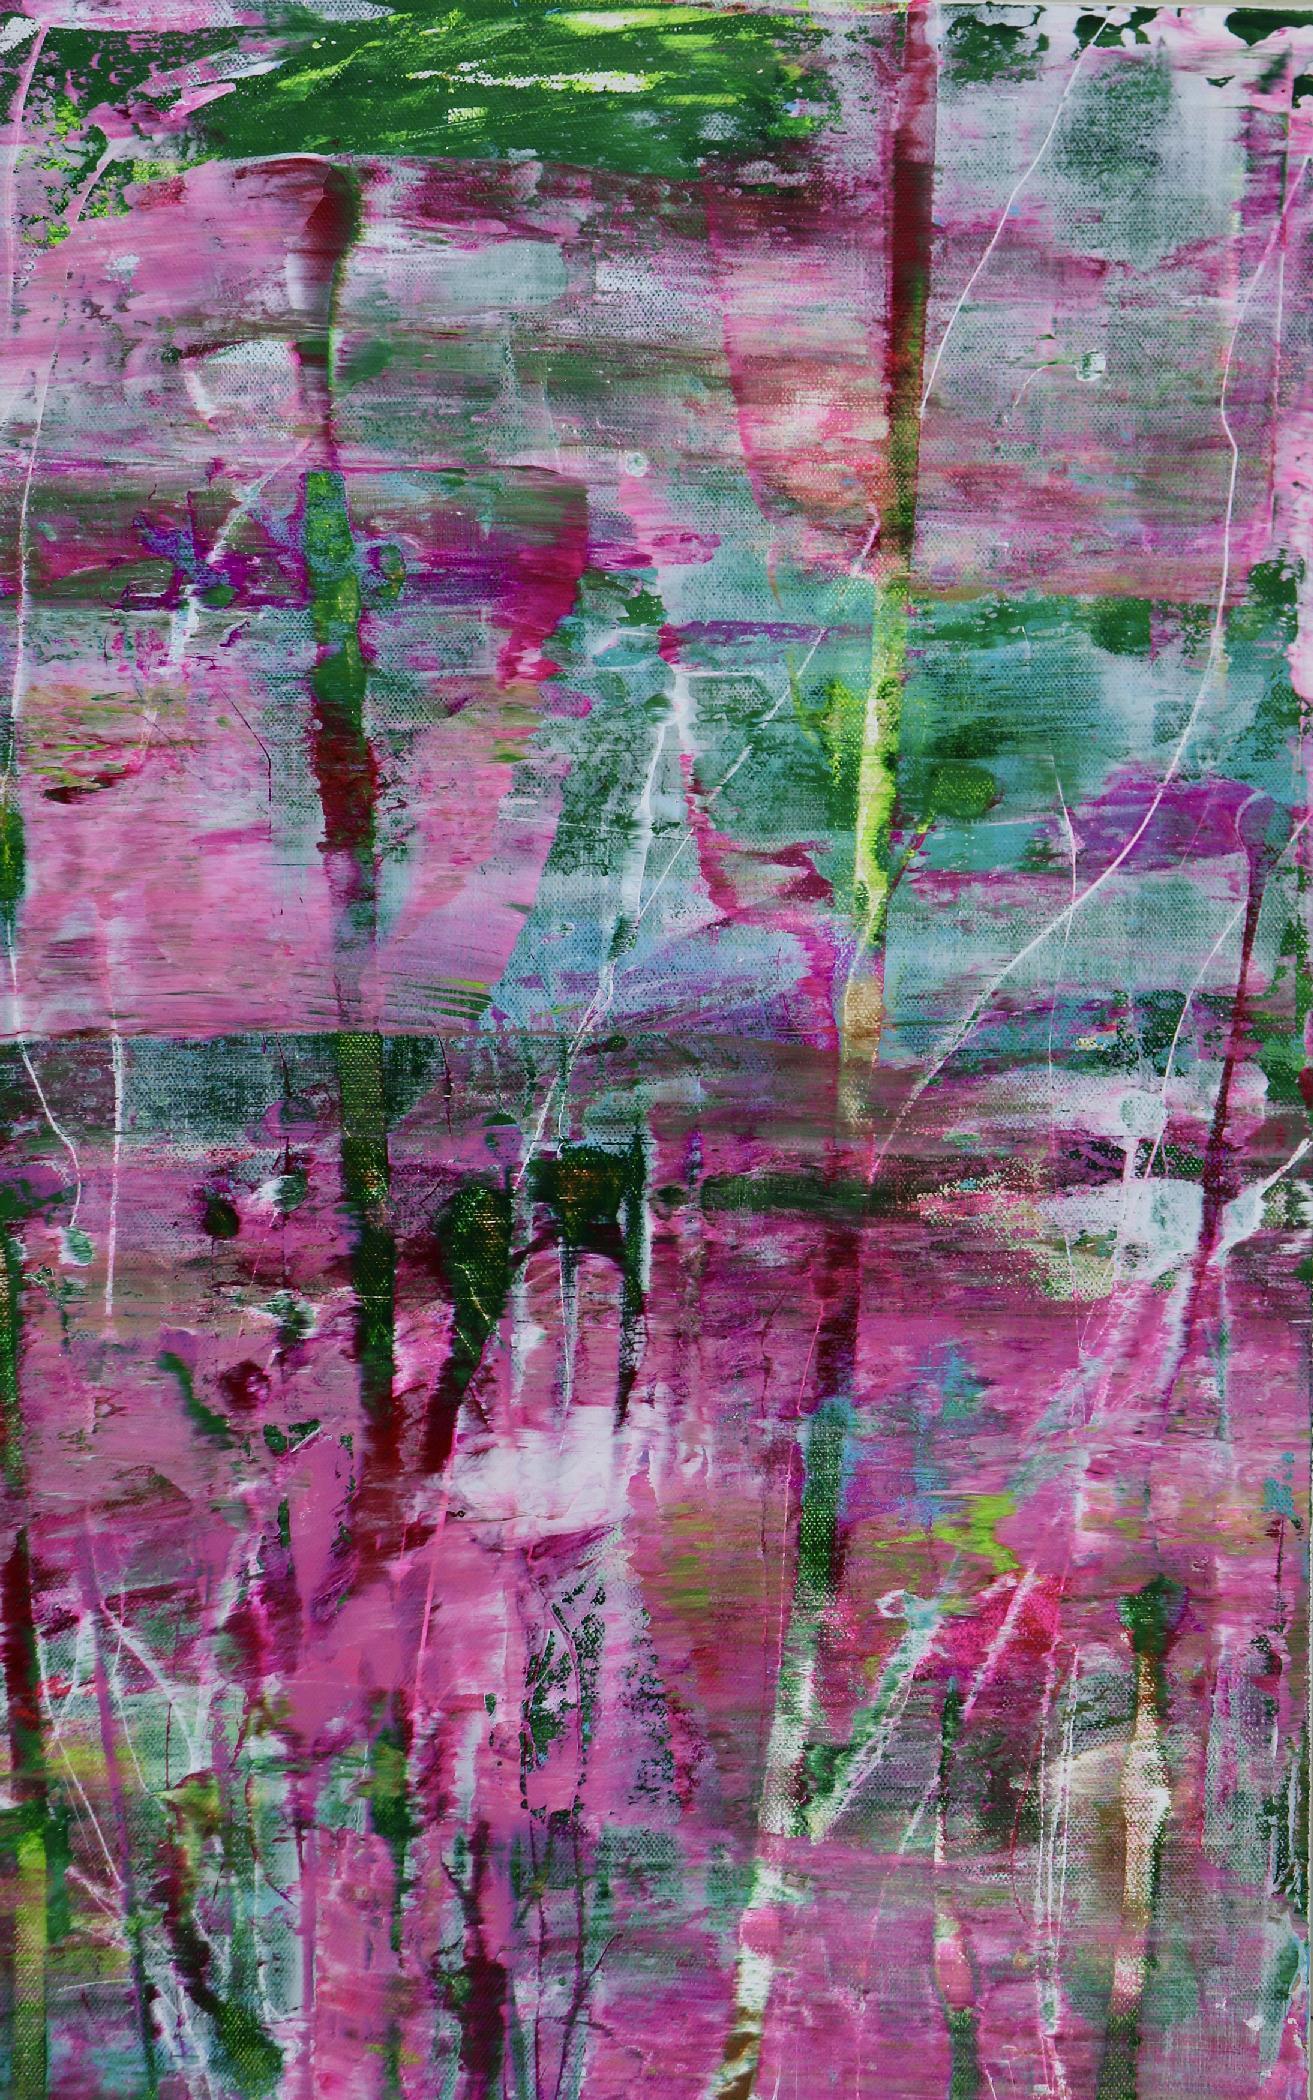 A Closer Look (Avant Garden) 2 (2020) by Nestor Toro - Los Angeles